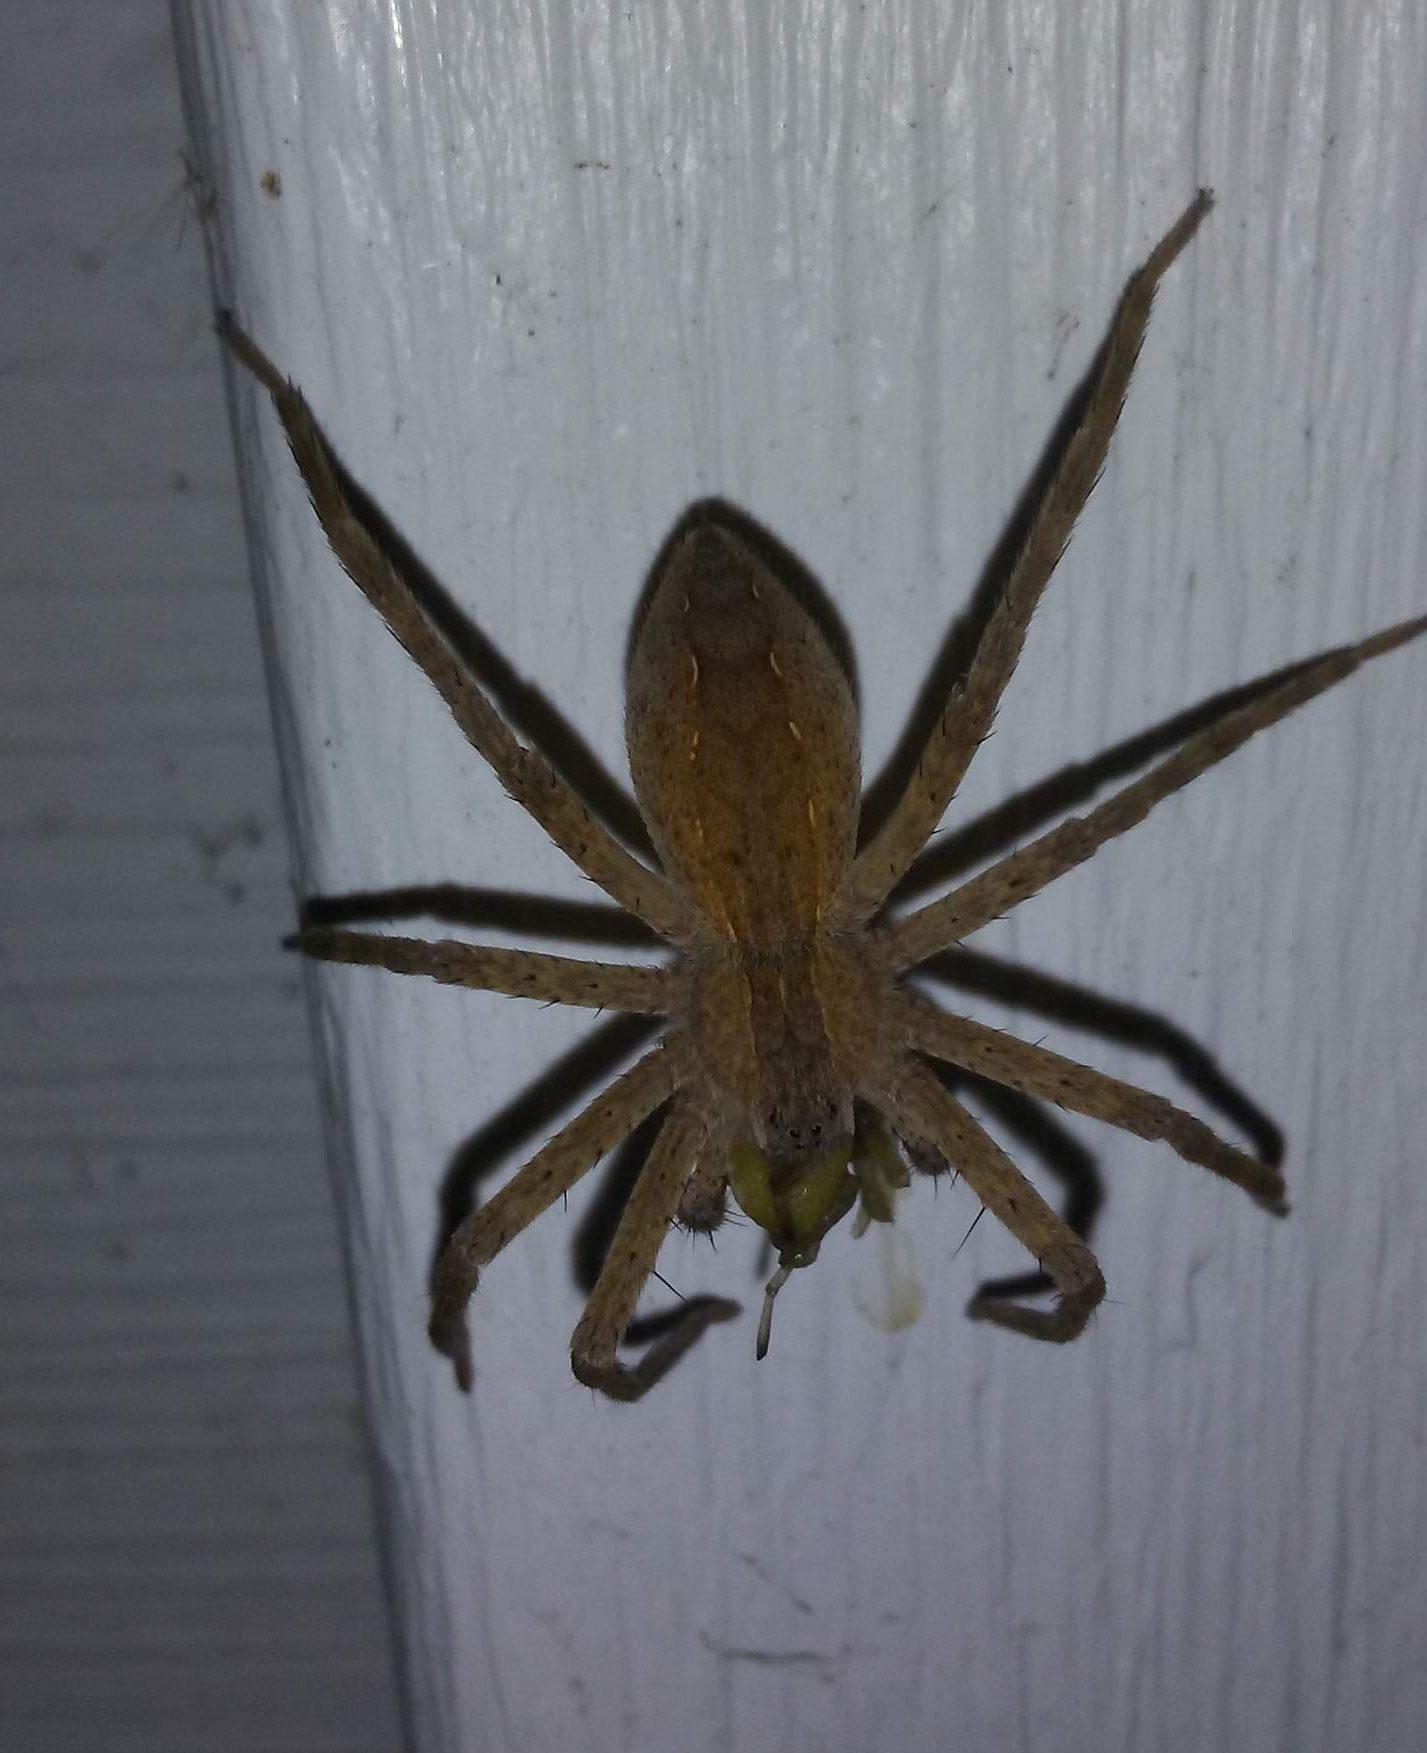 Picture of Pisaurina mira (Nursery Web Spider) - Dorsal,Prey